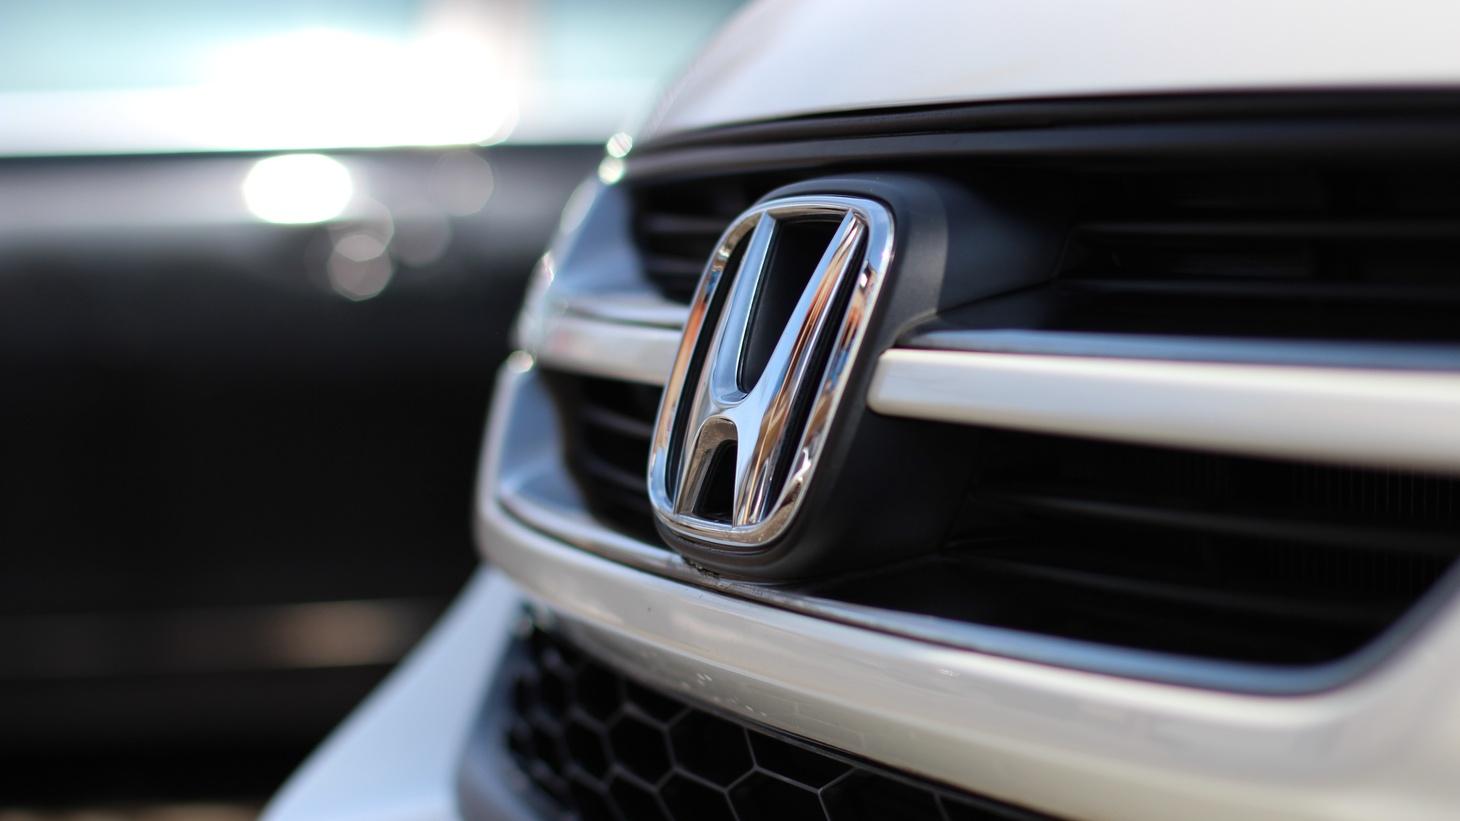 The Honda logo.